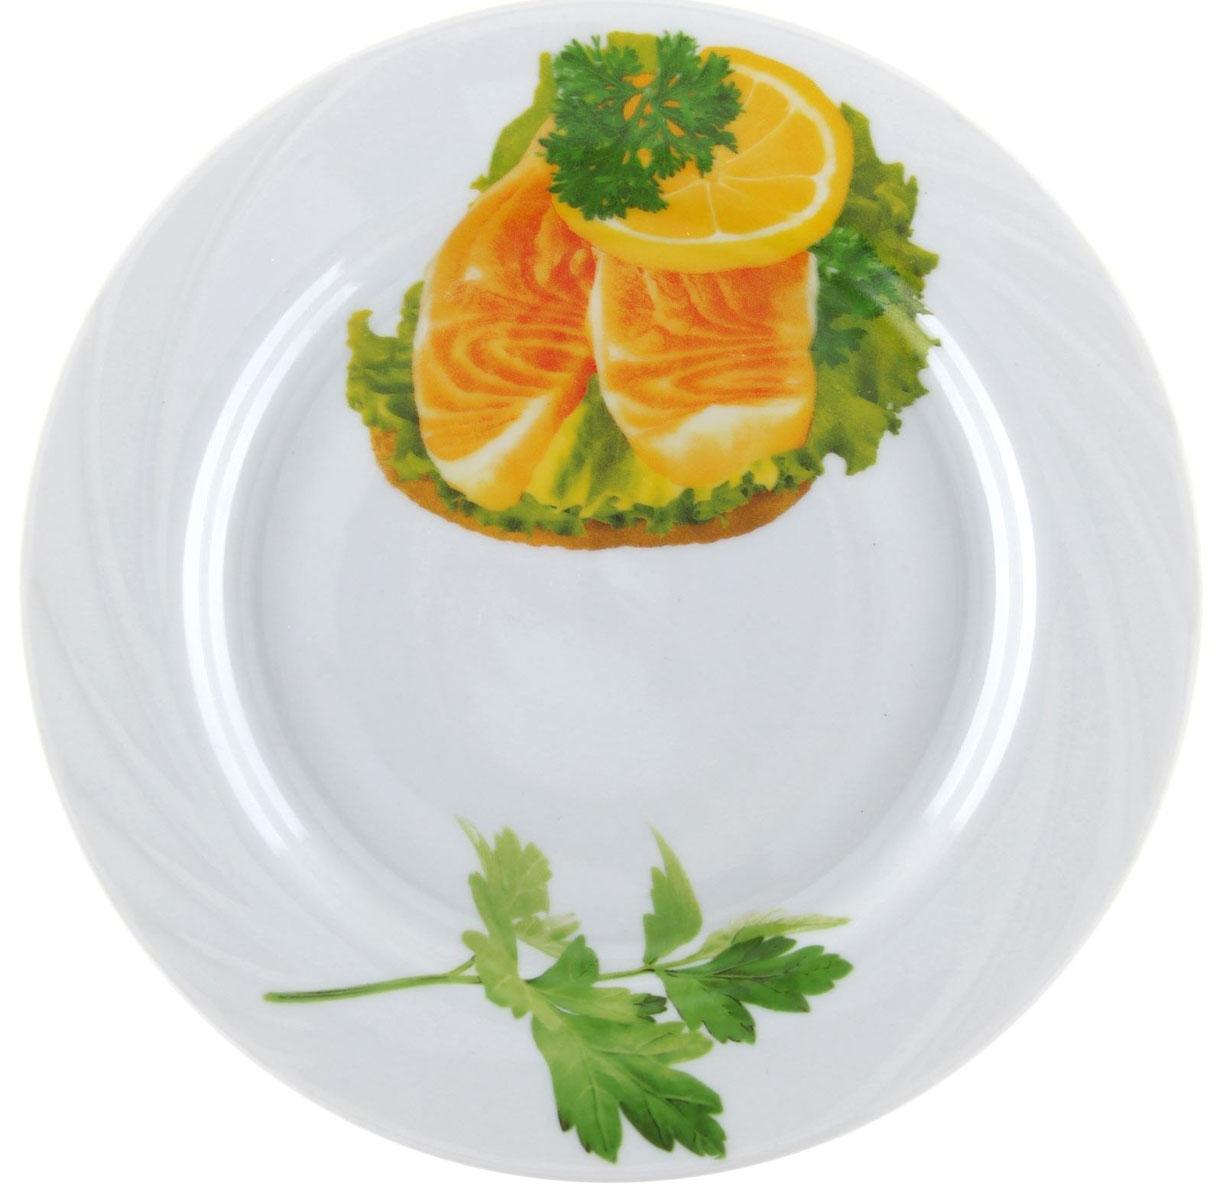 Тарелка мелкая Голубка. Бутерброды, диаметр 20 см селедочница голубка ассорти длина 25 см